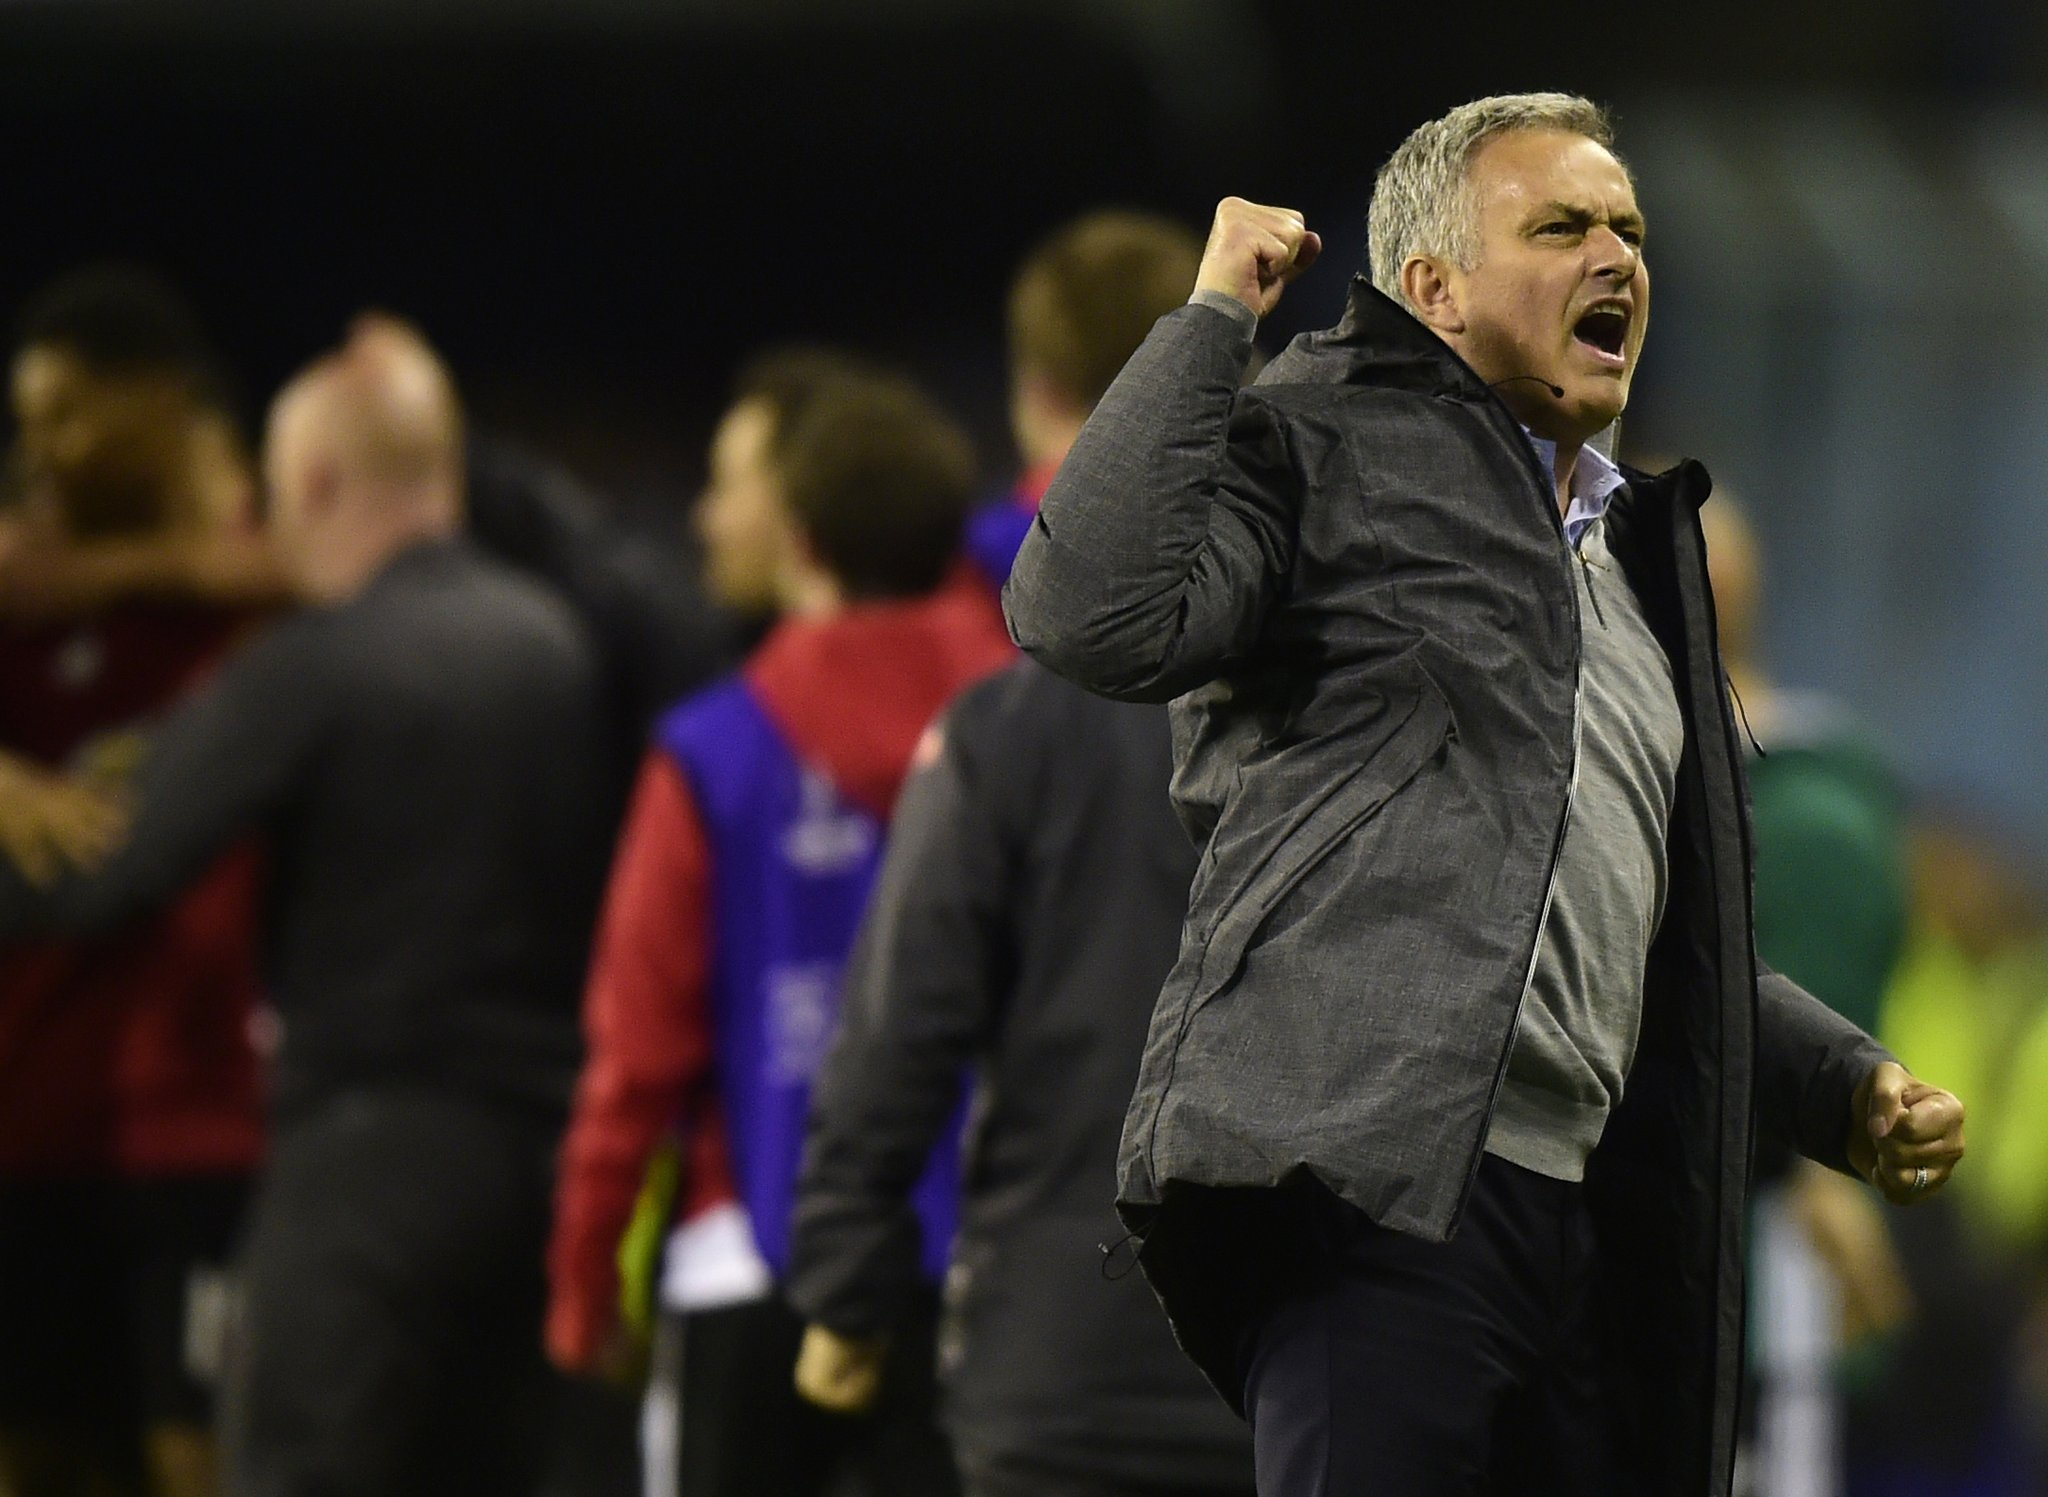 Mourinho Unhappy With United's Missed Chances Despite Win, Praises Rashford